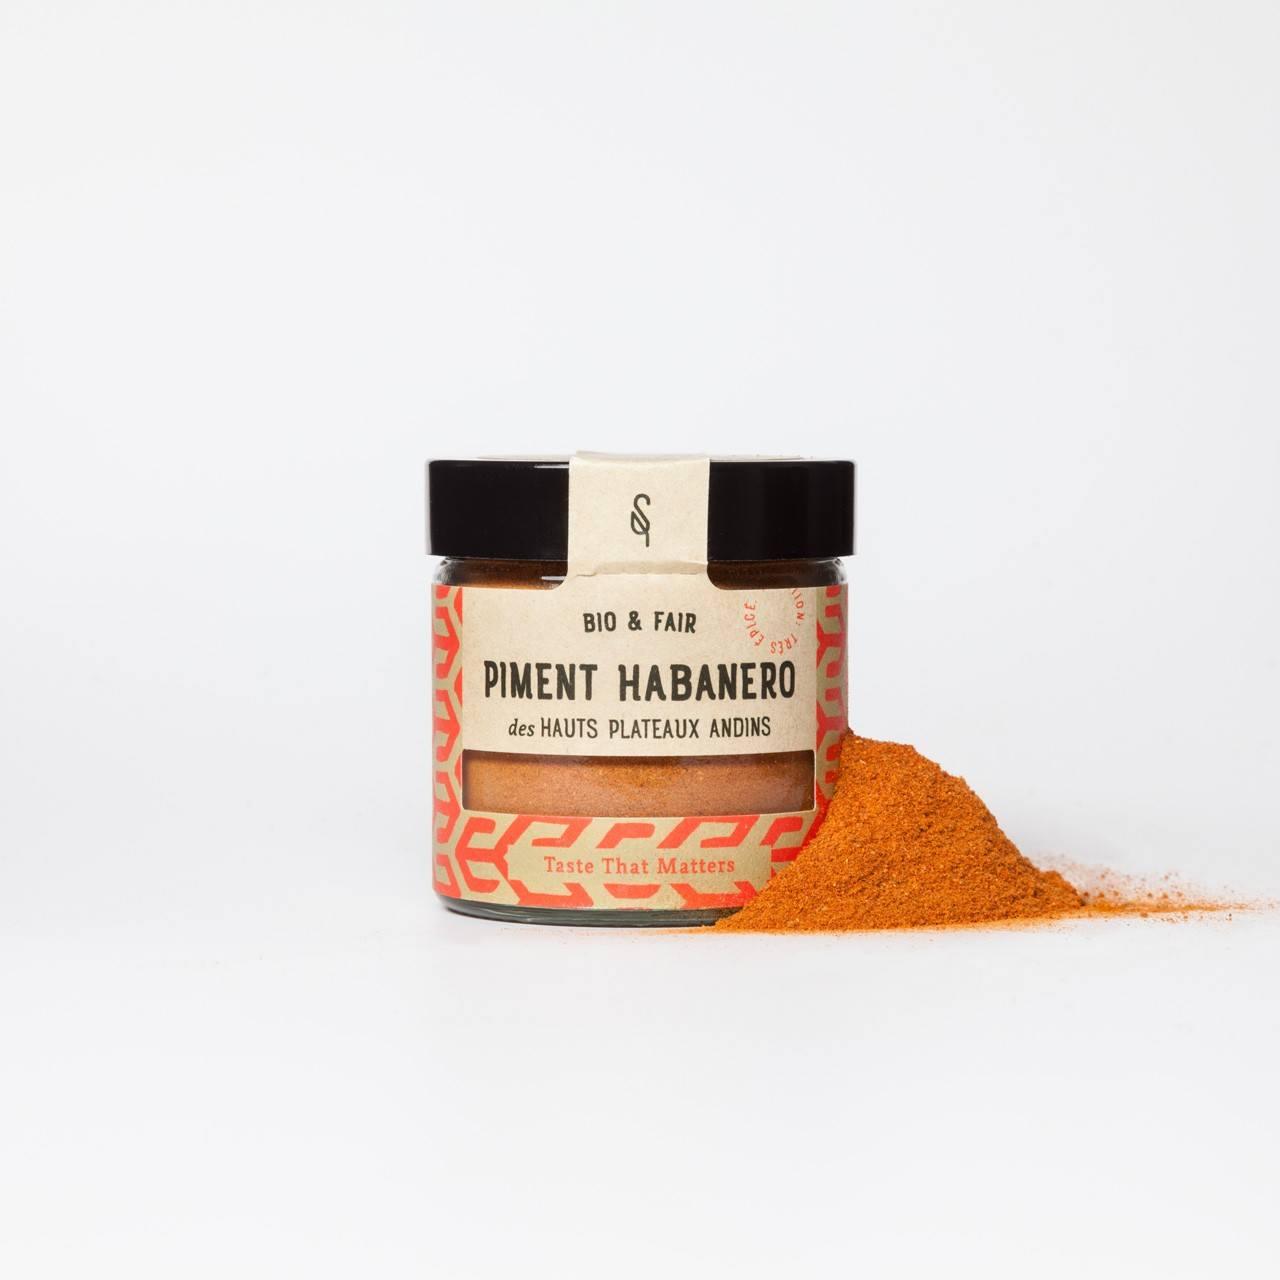 Piment Habanero SoulSpice